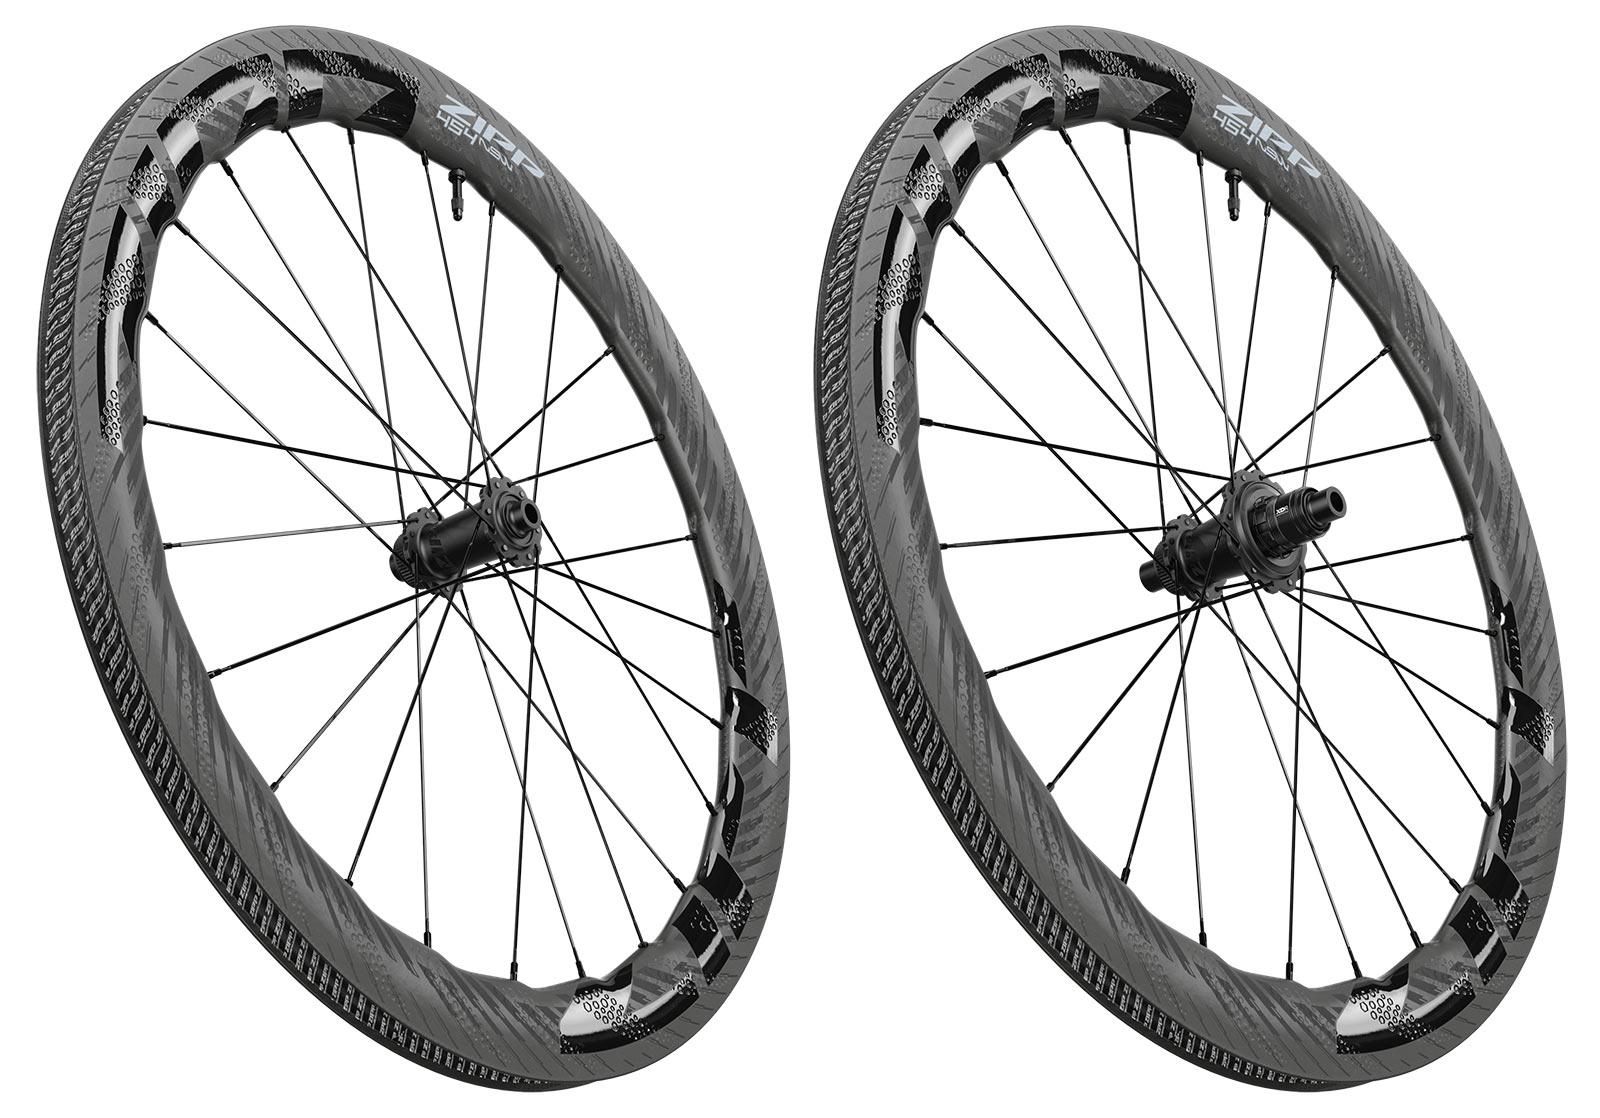 2022 zipp 454 NSW tubeless disc brake road bike wheels angle view